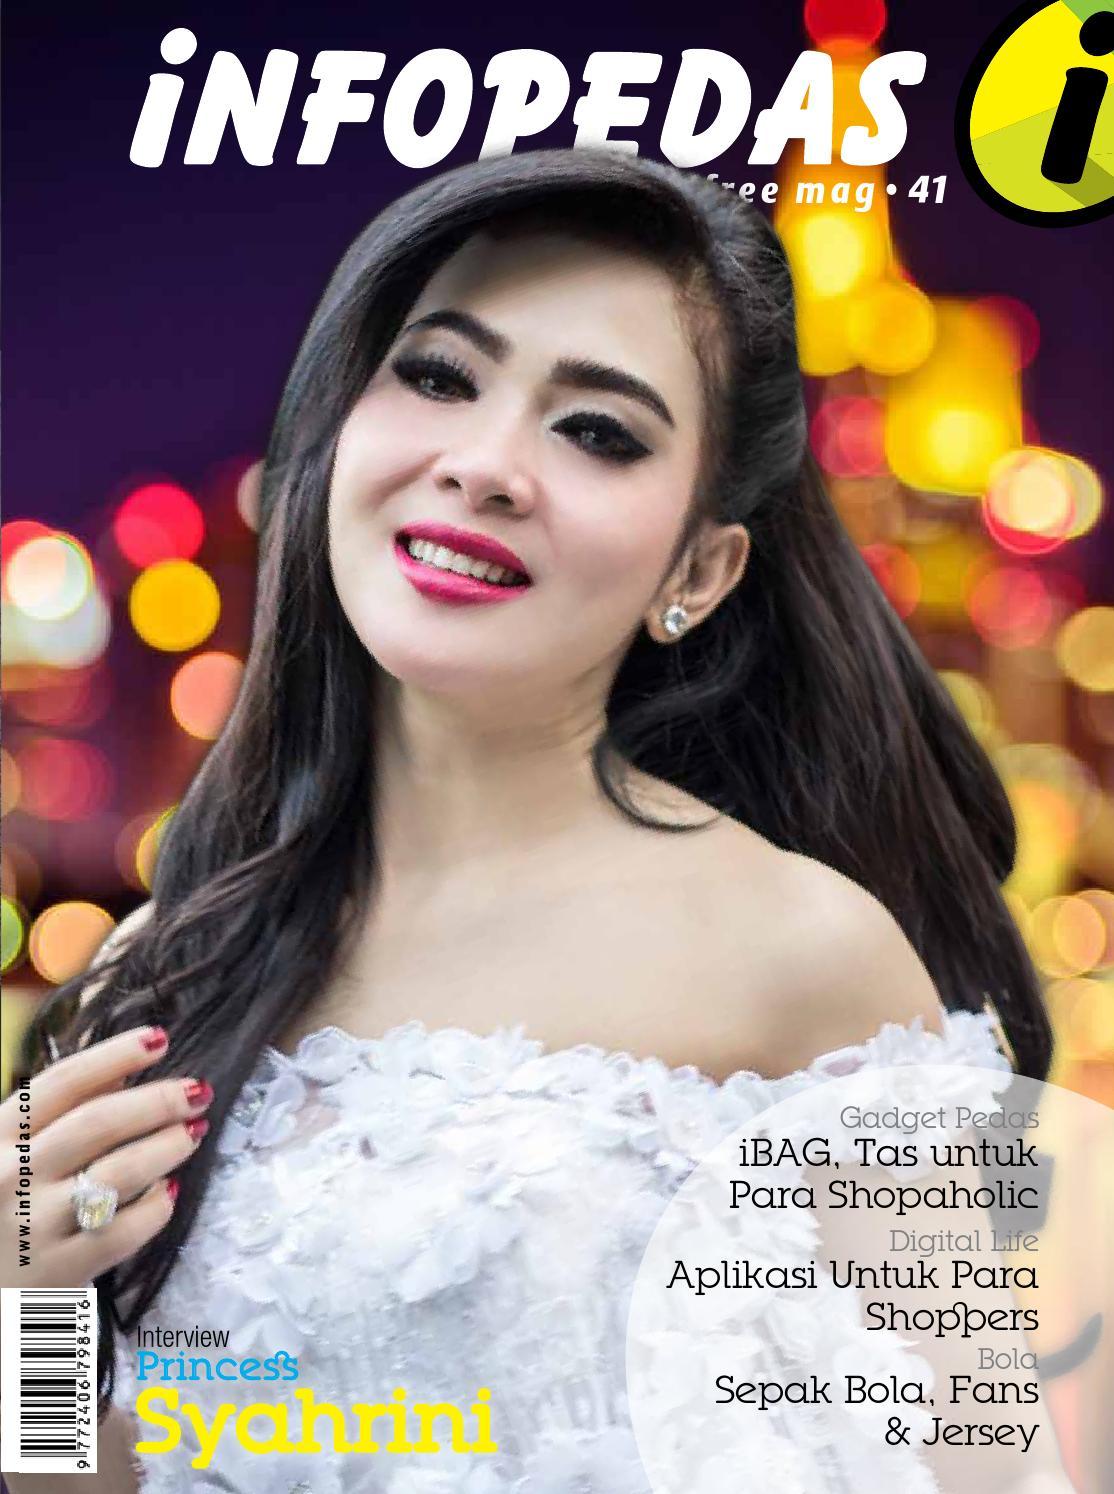 Majalah Infopedas Edisi 41 By Pedas Issuu E Voucher 200 Double Point Sticker Tiara Gatzu Monang Maning Toko Soputan